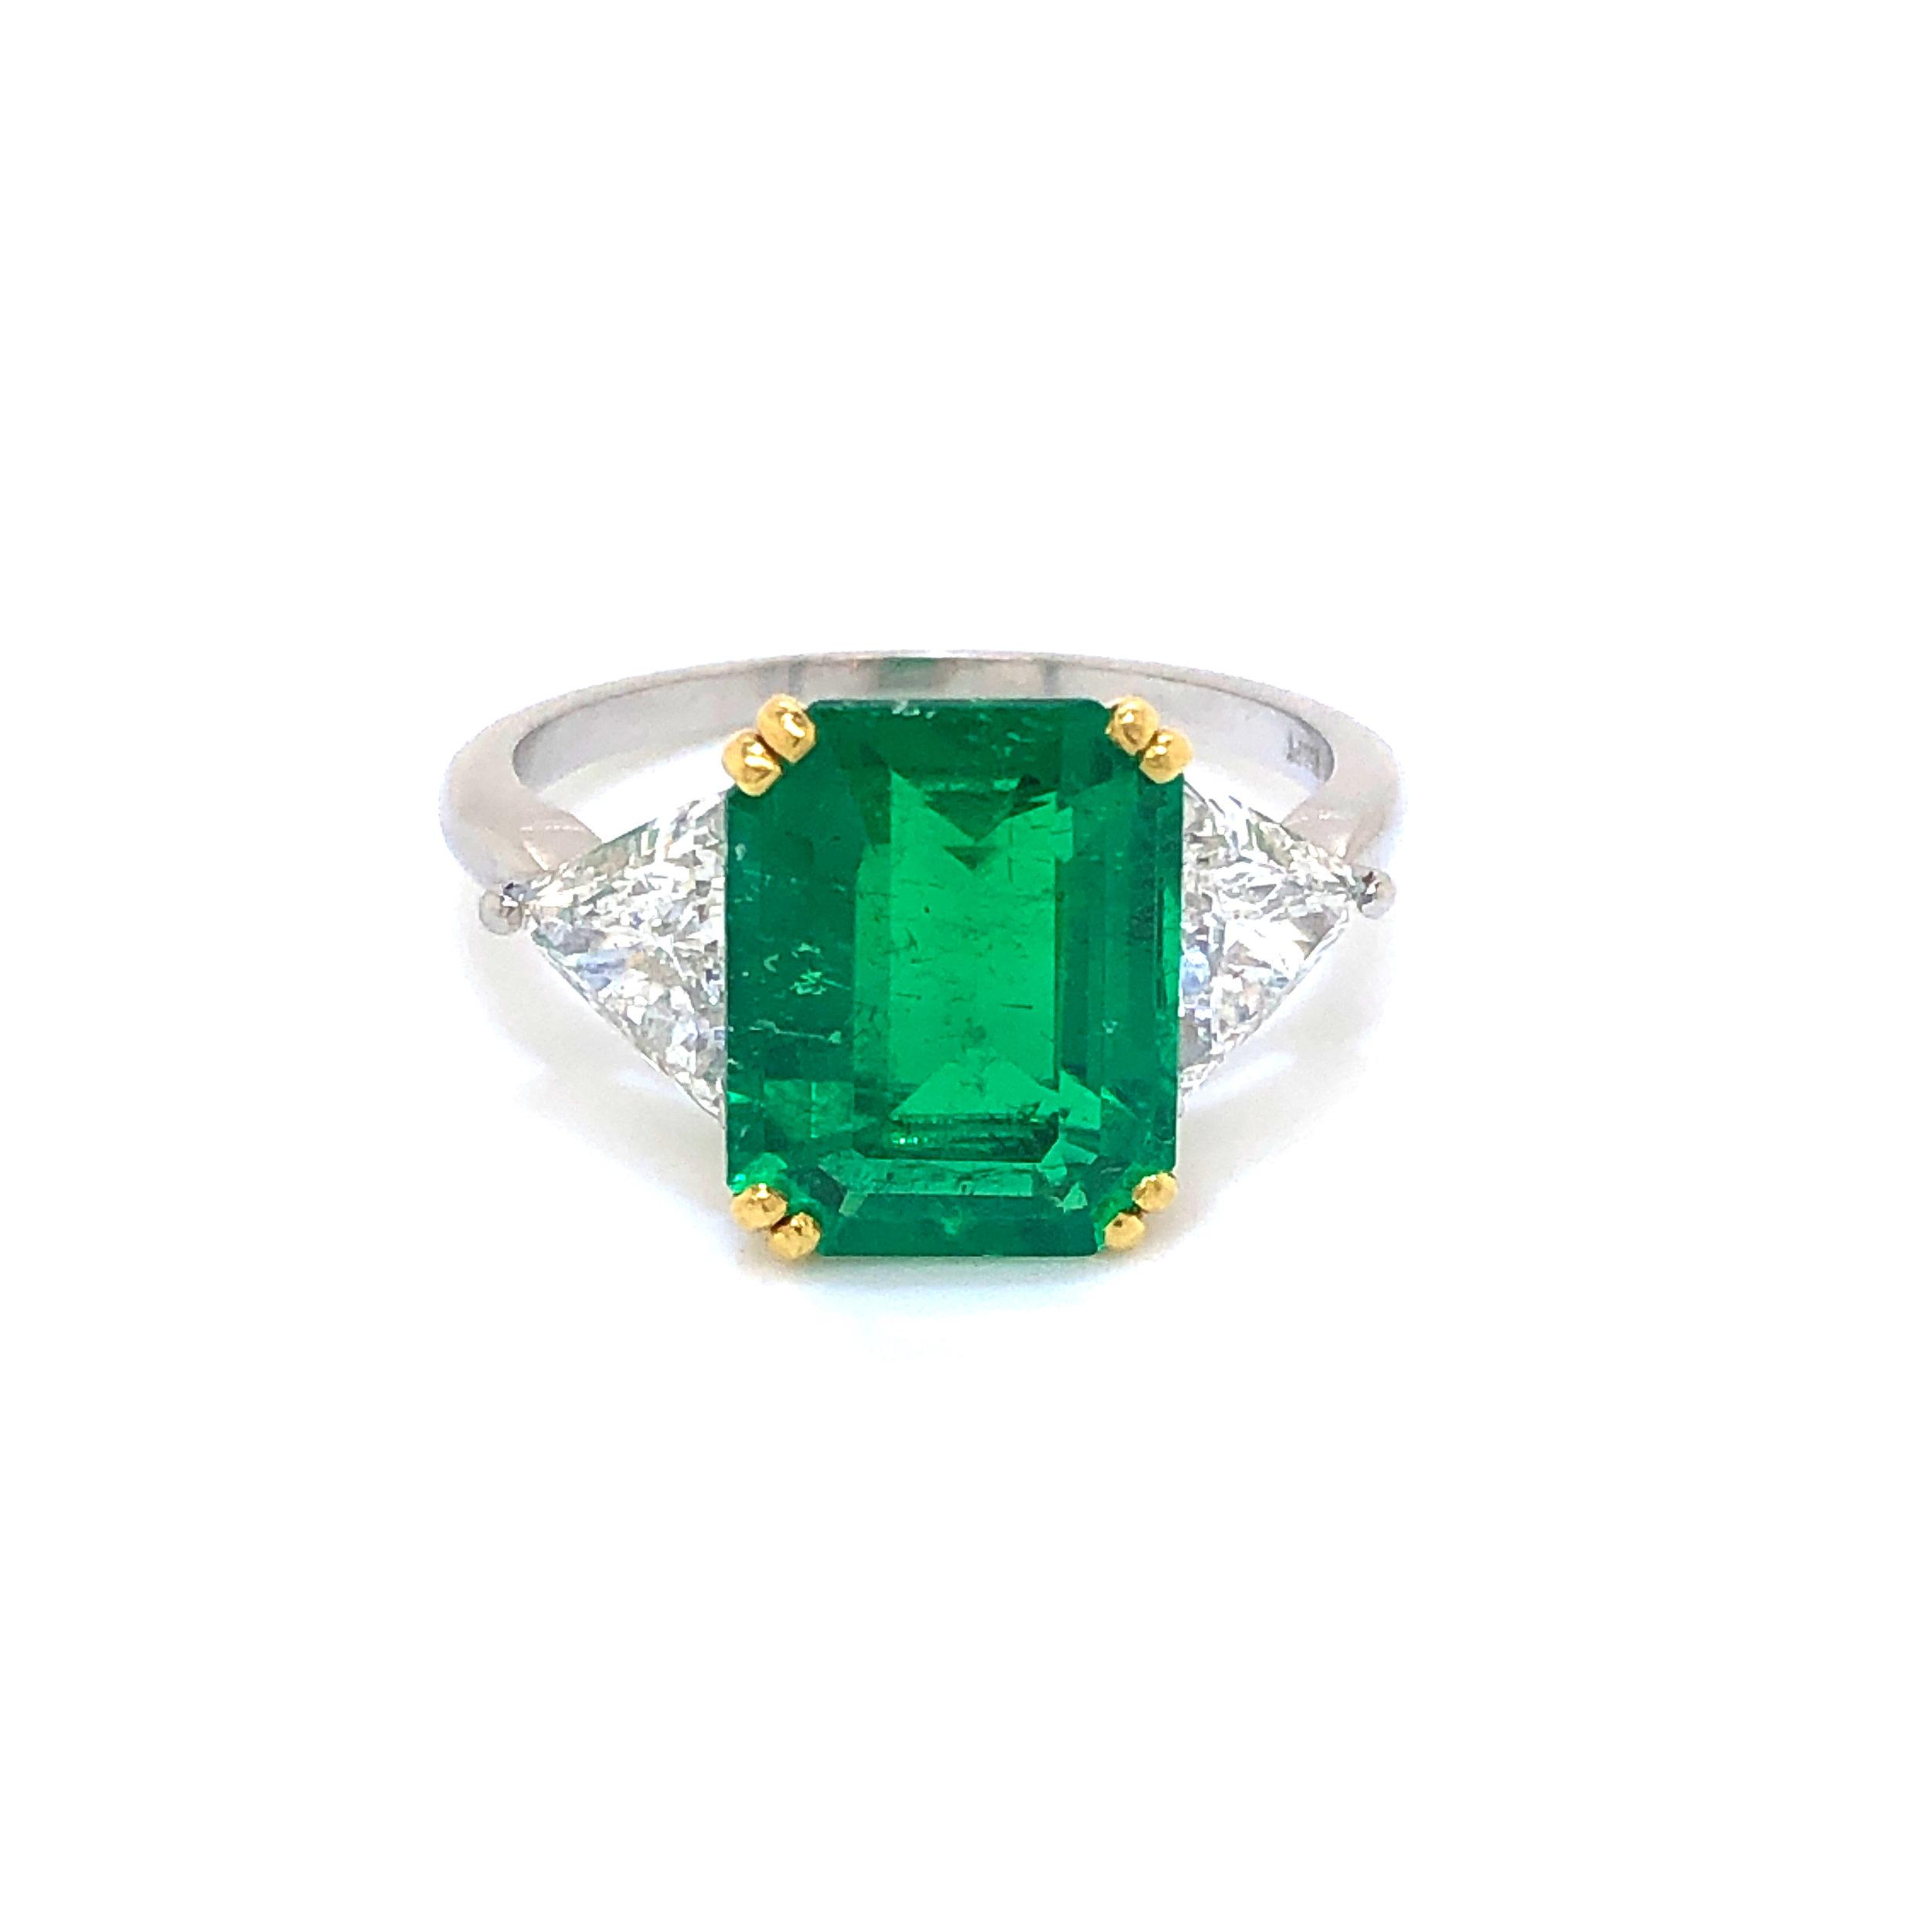 3-Stone Ring, 18kt Yellow Gold & Platinum Emerald Center with Diamond Trillions  Est. US$ 3,000-4,000